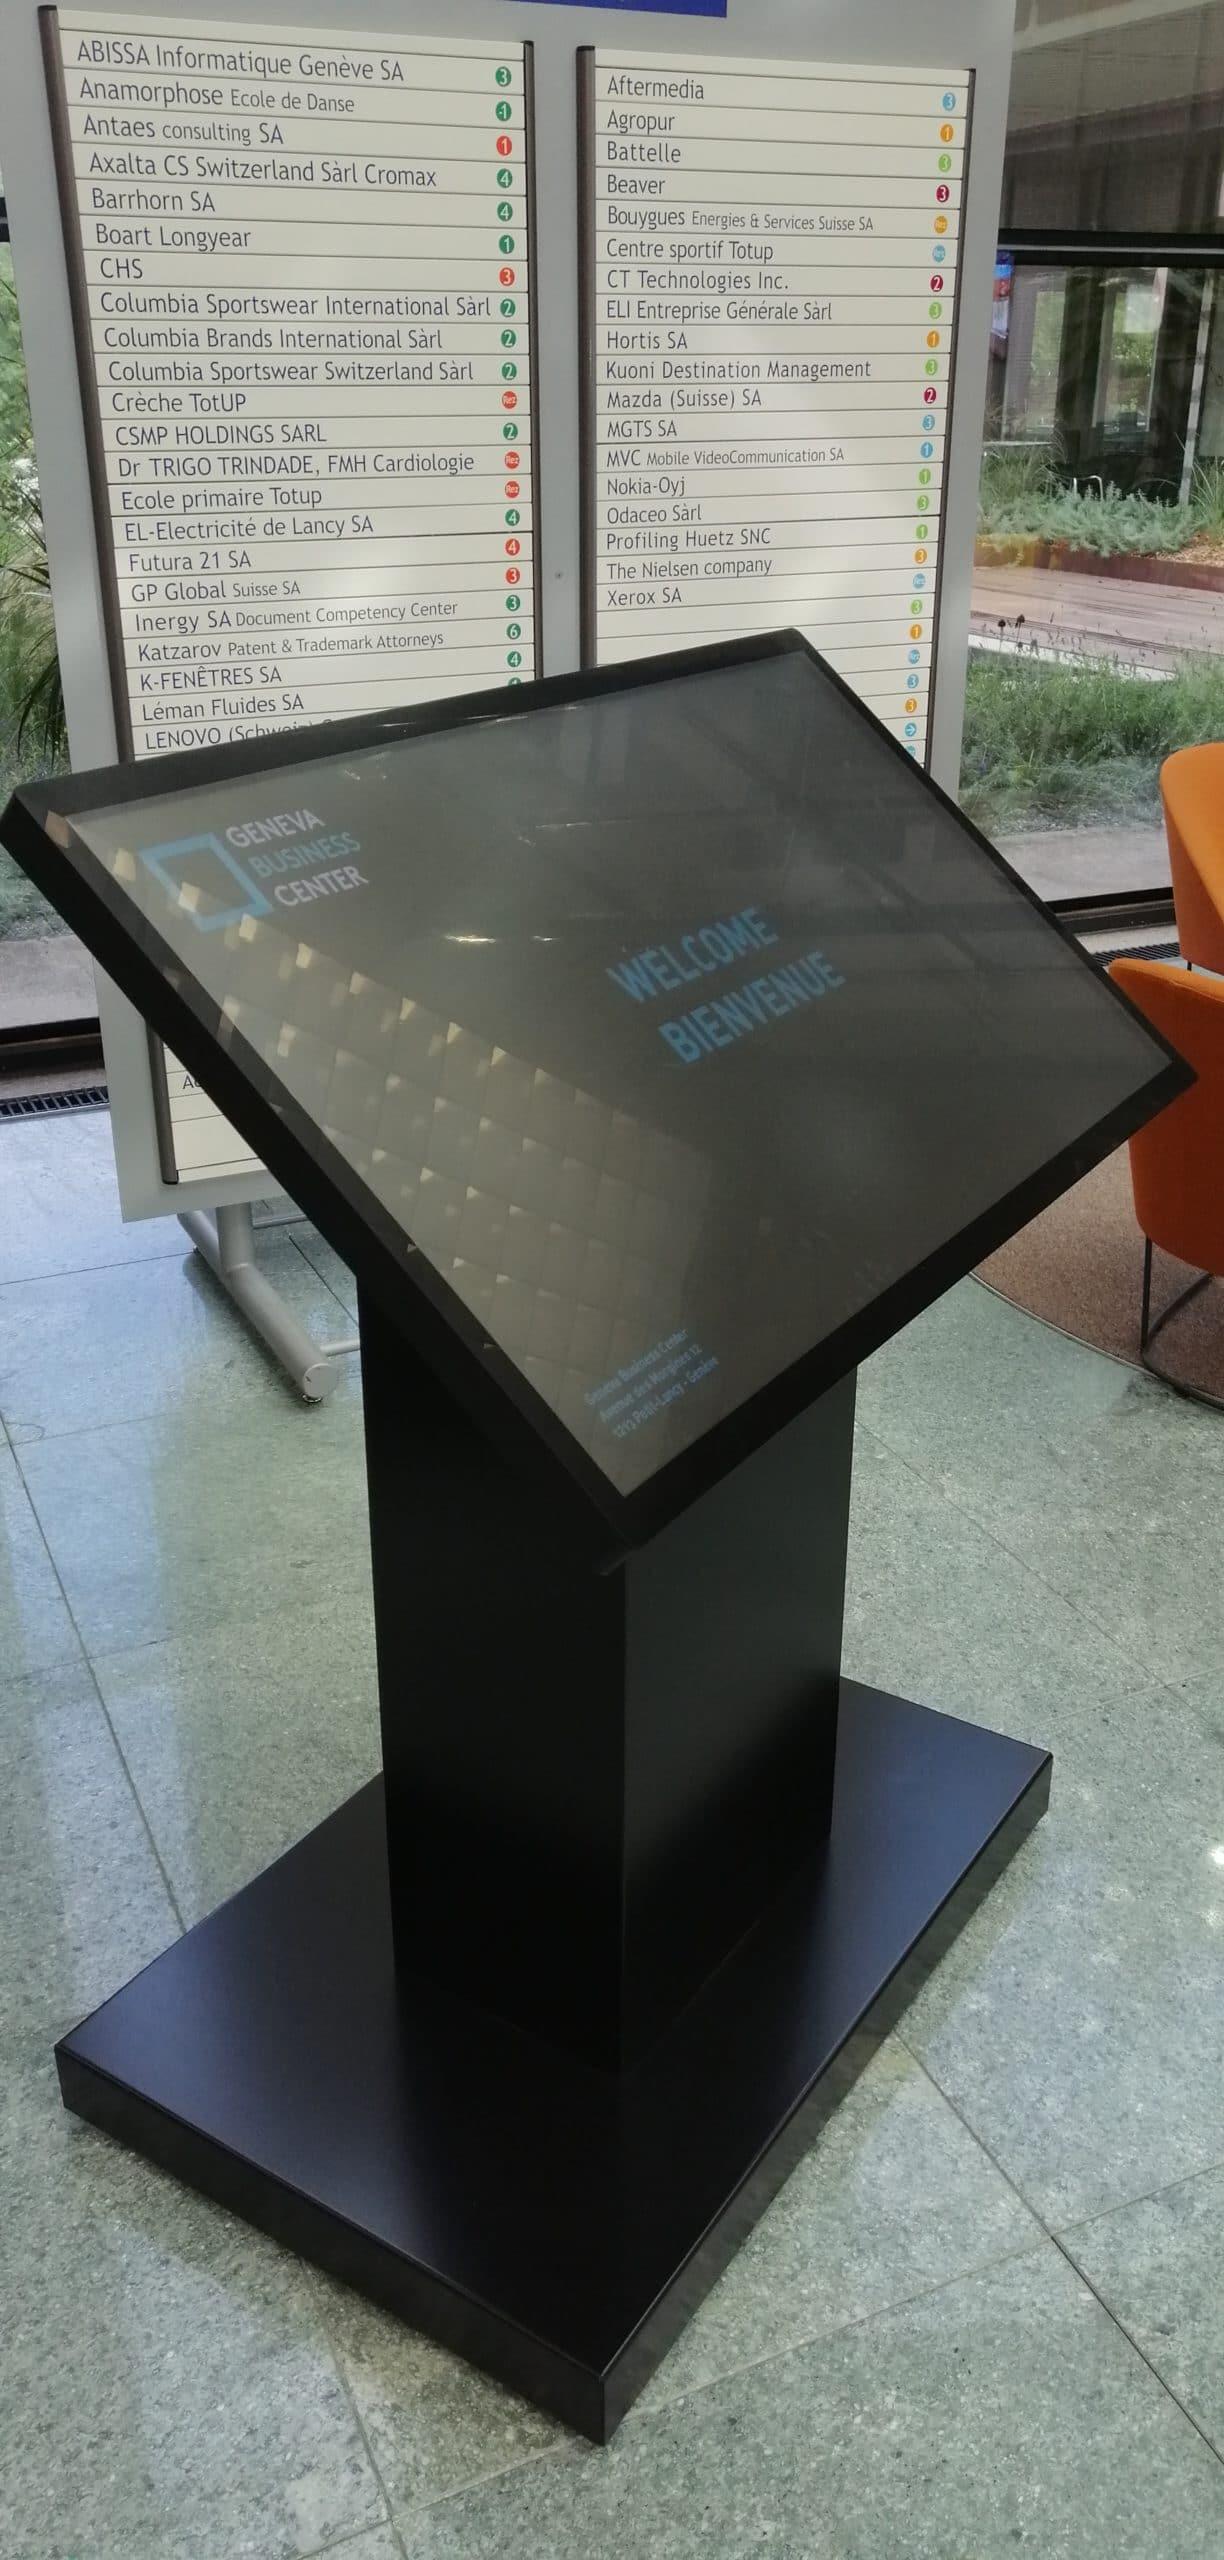 Geneva Business Center Borne profil avec message bienvenu